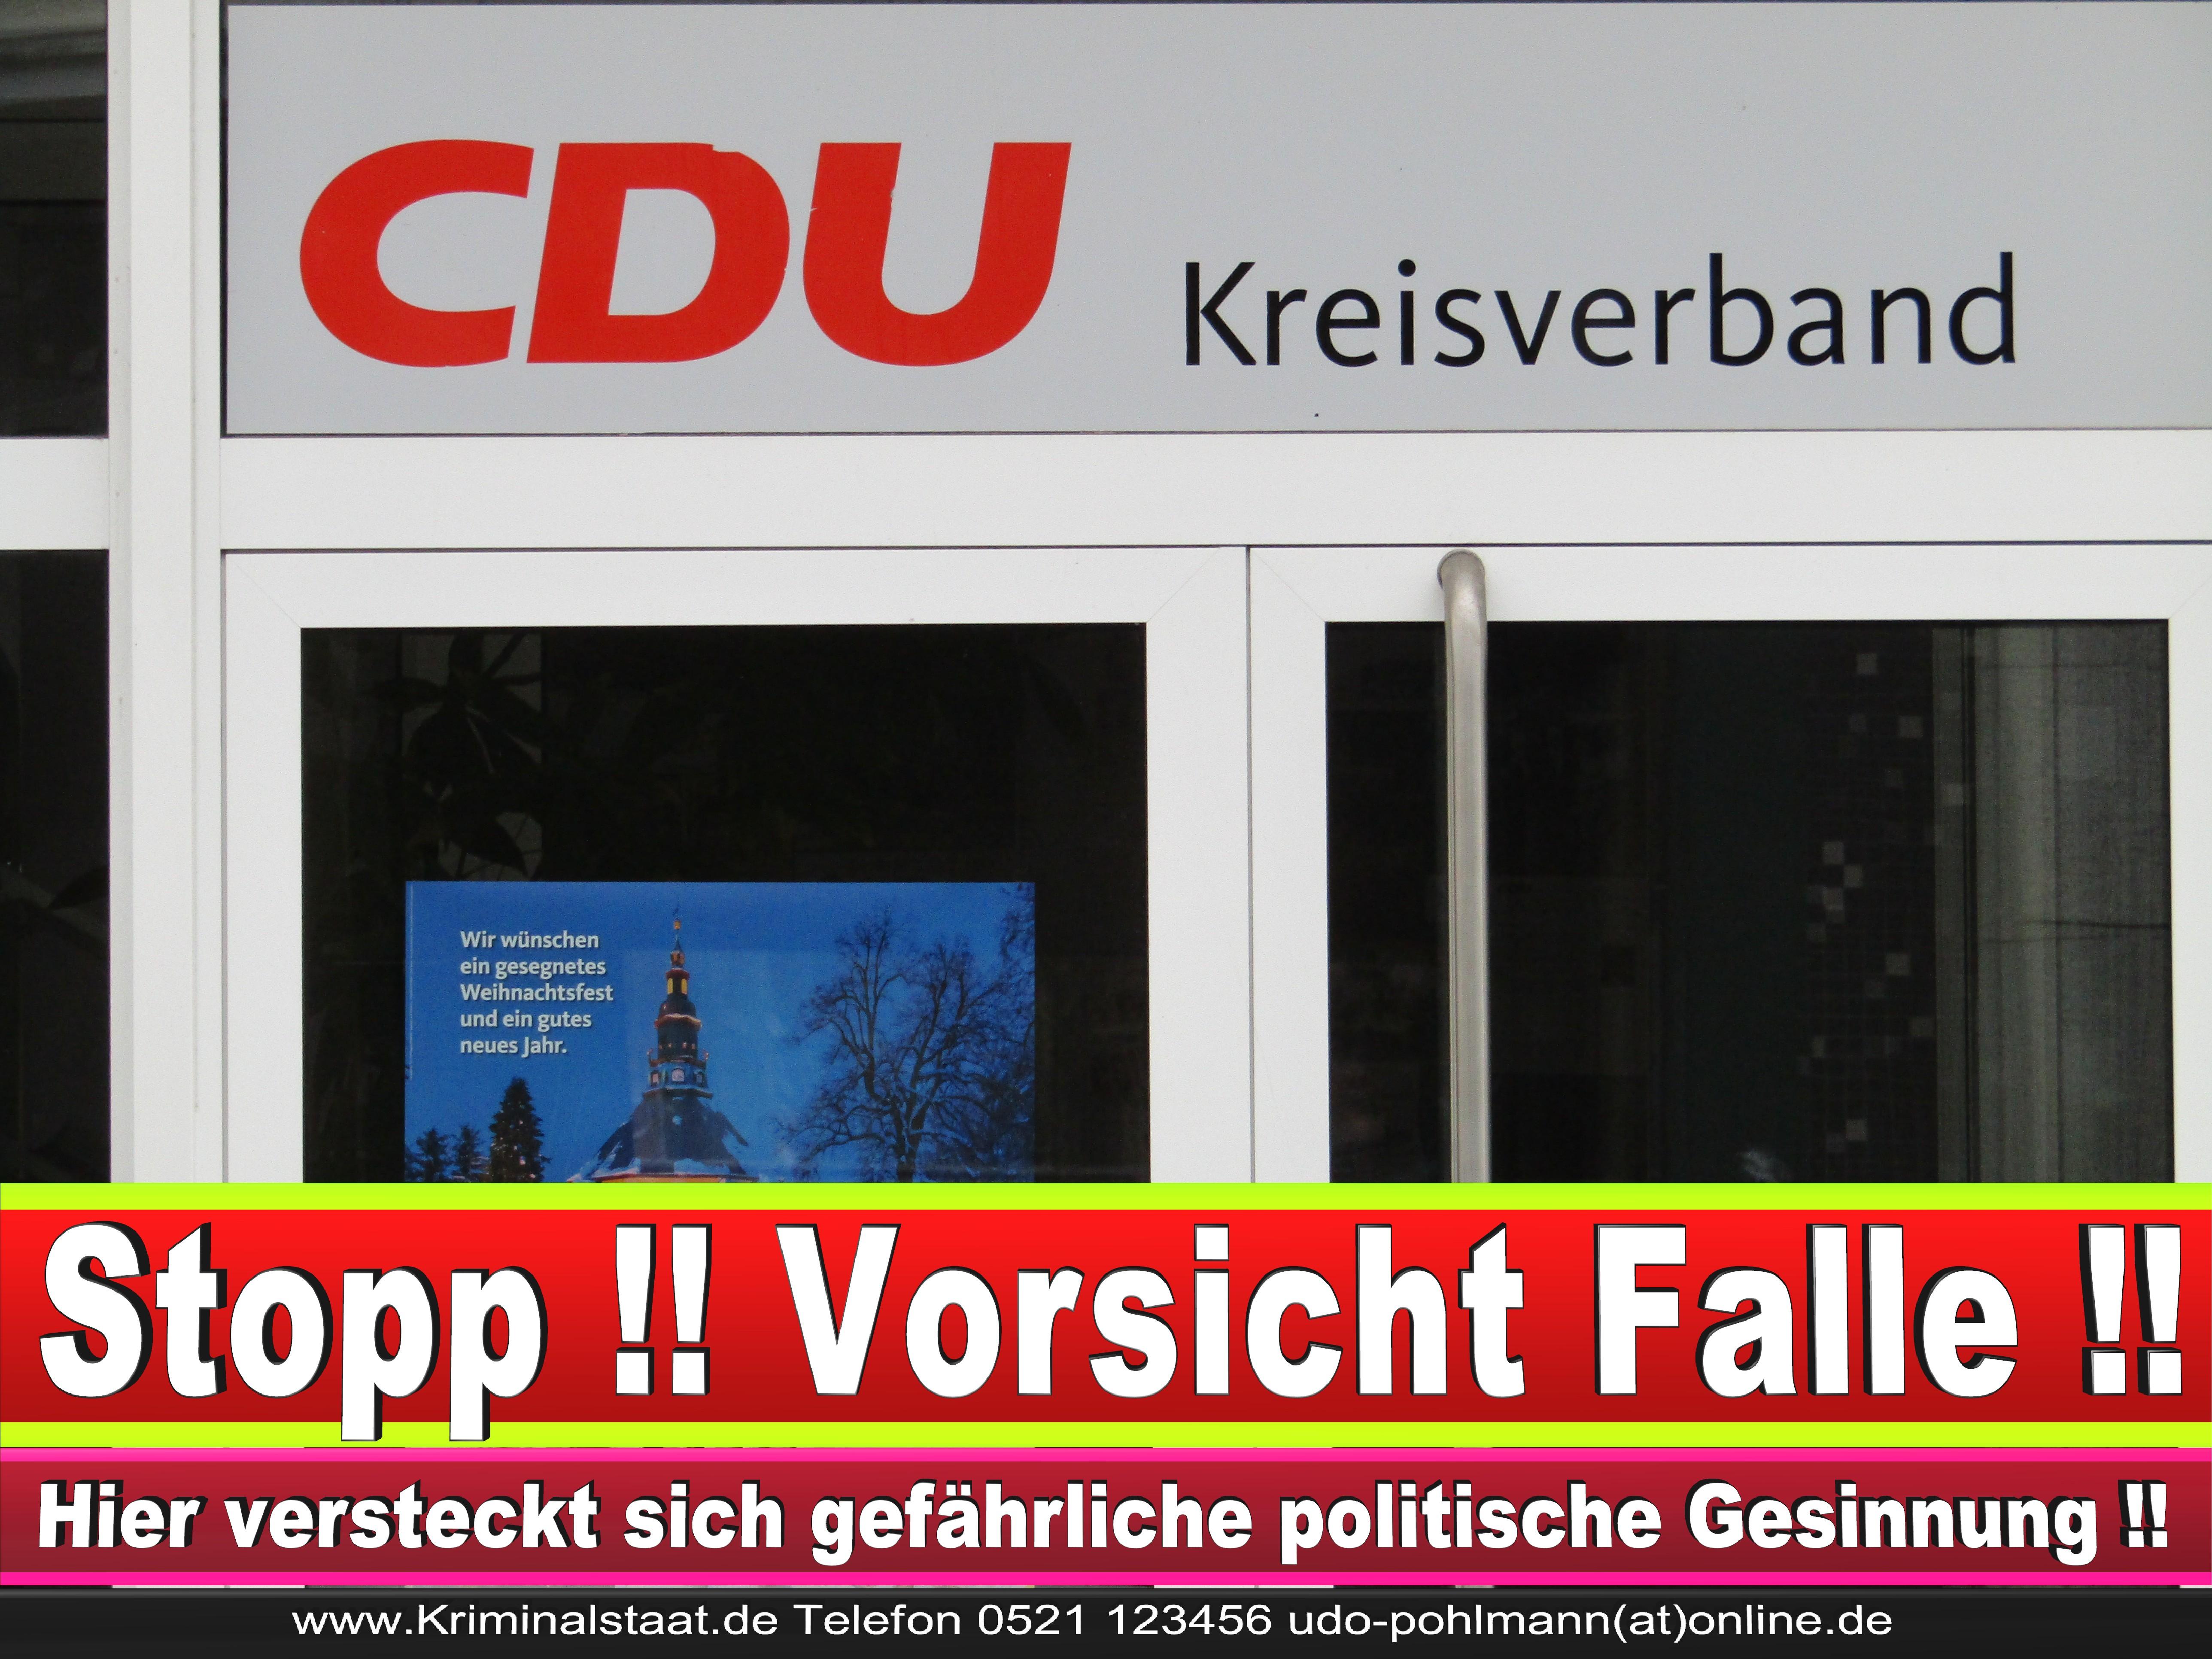 CDU DORTMUND KREISVERBAND BüRGERBüRO CDU FRAKTION ORTSVERBAND CDU NRW GESCHäFTSSTELLE ADRESSE RATSMITGLIEDER CDU (27) 1